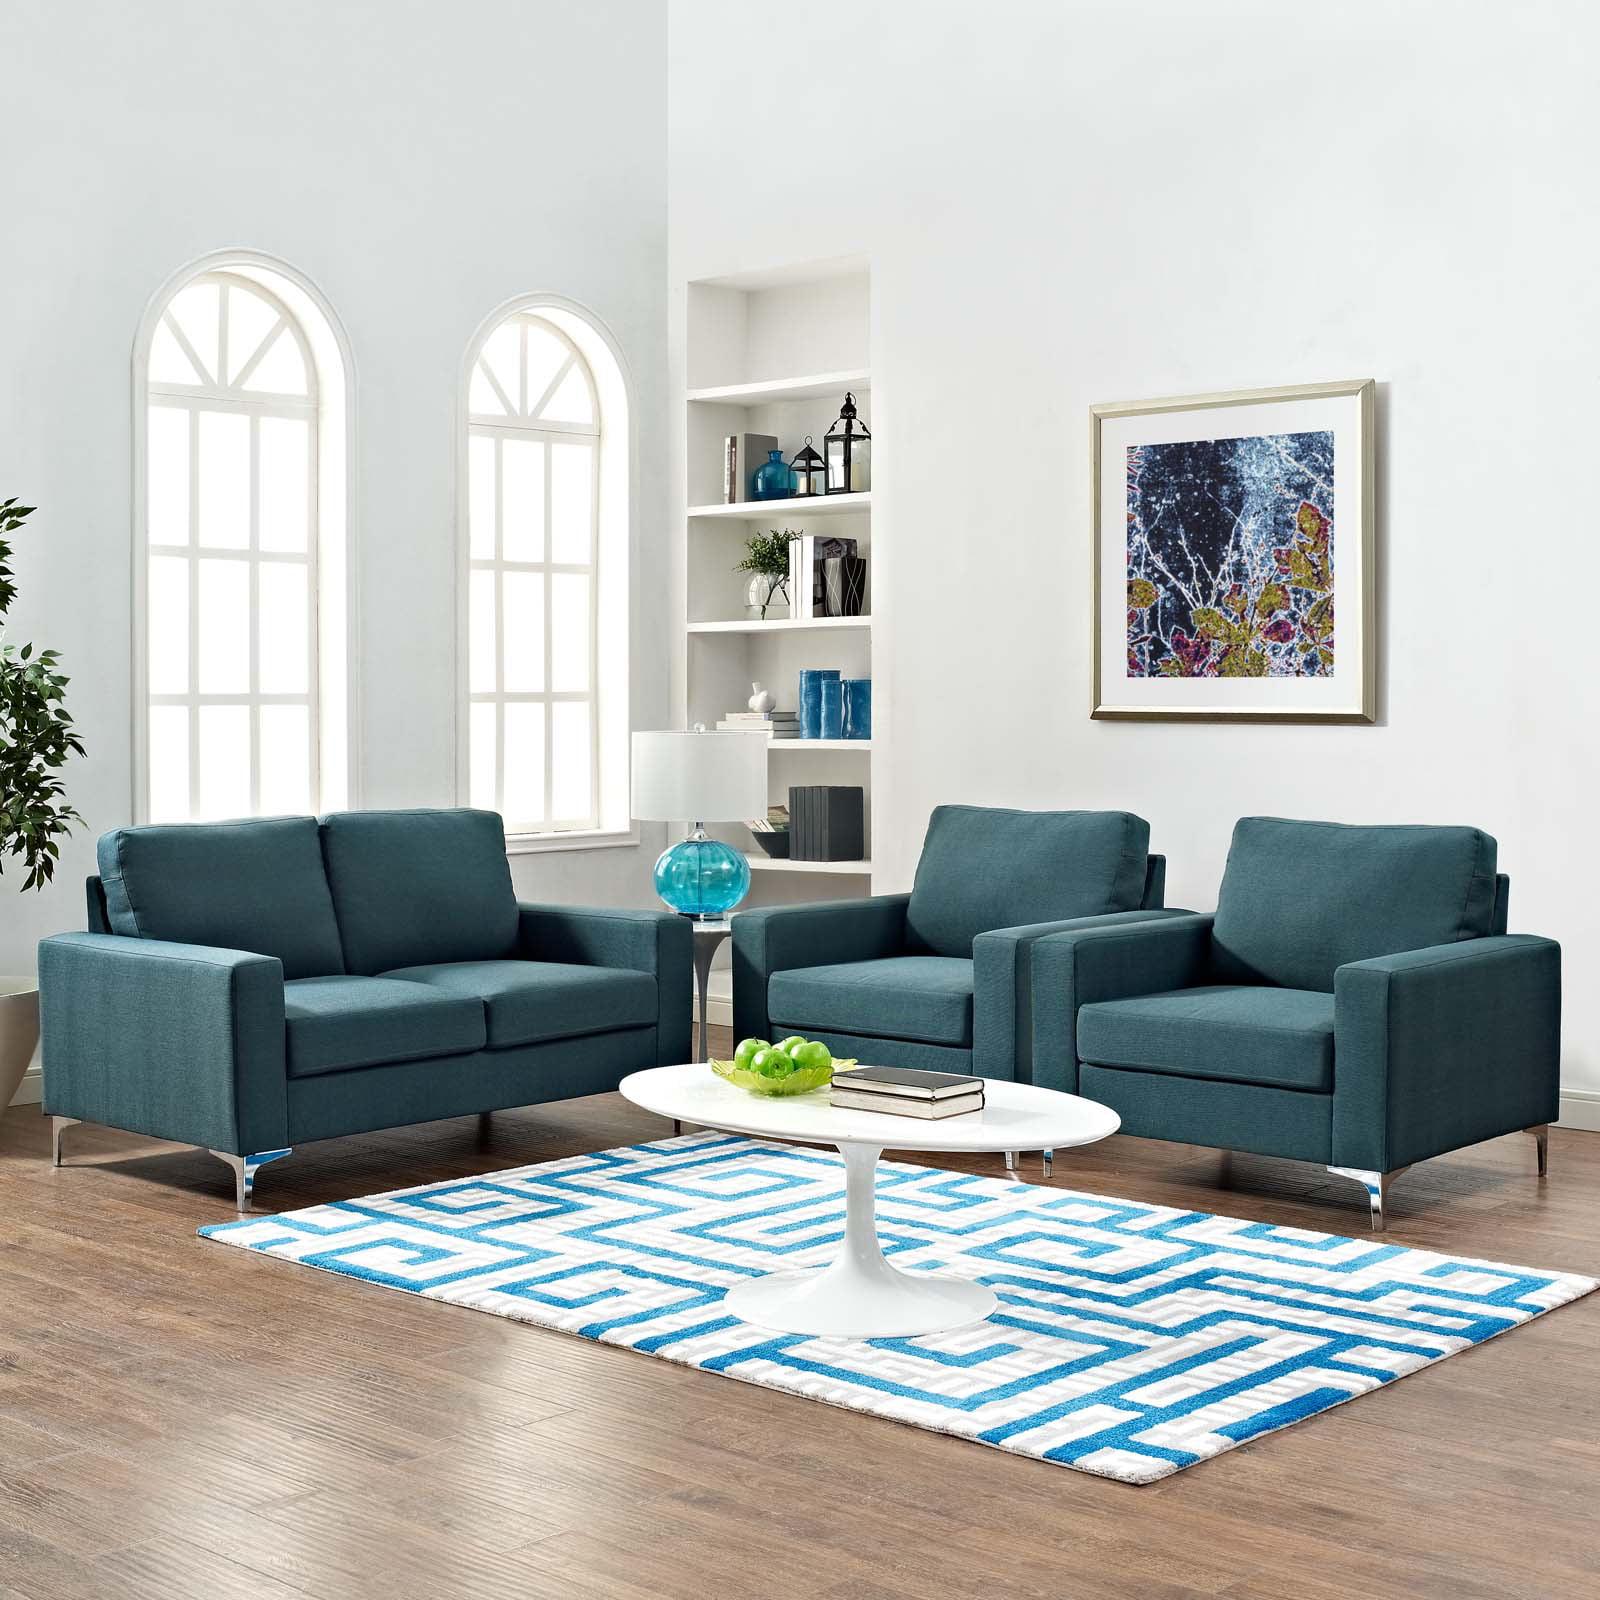 Modway Allure 3 Piece Sofa and Armchair Set, Multiple Colors